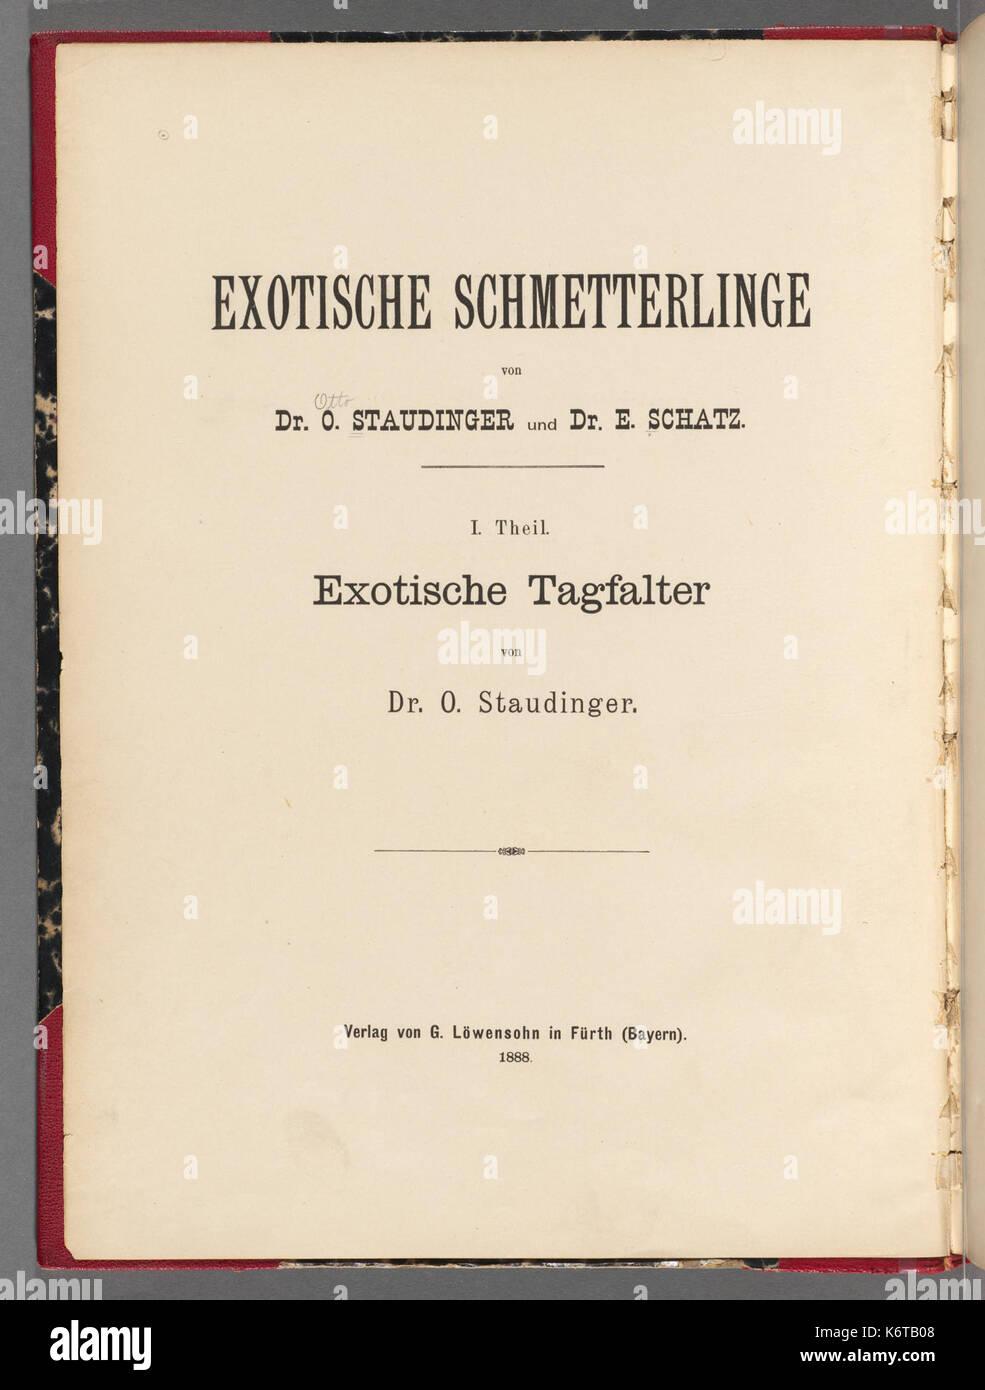 Exotische schmetterlinge BHL40070351 - Stock Image